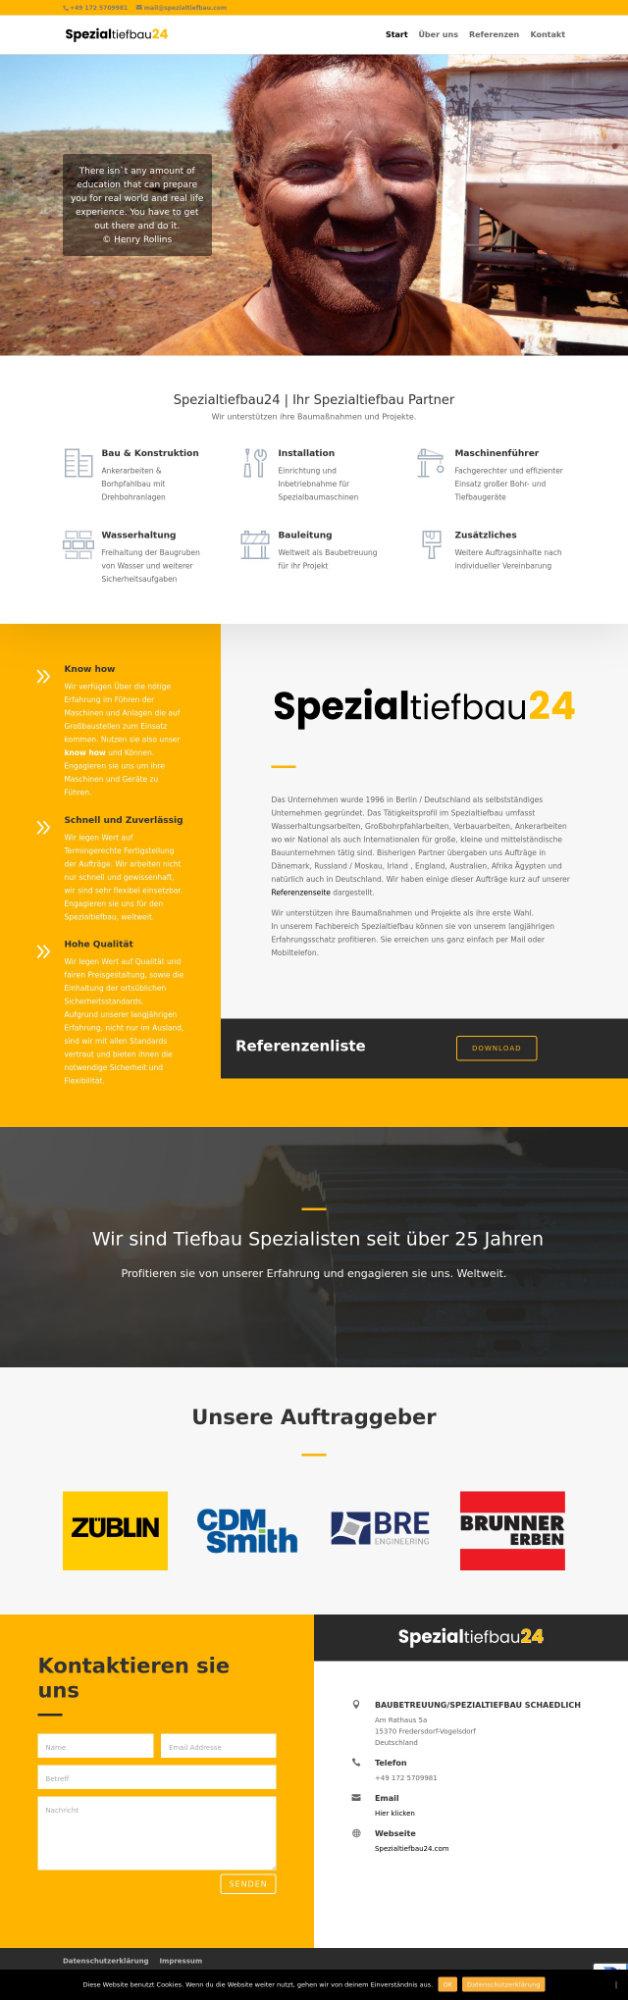 Spezialtiefbau24-full-screen-1